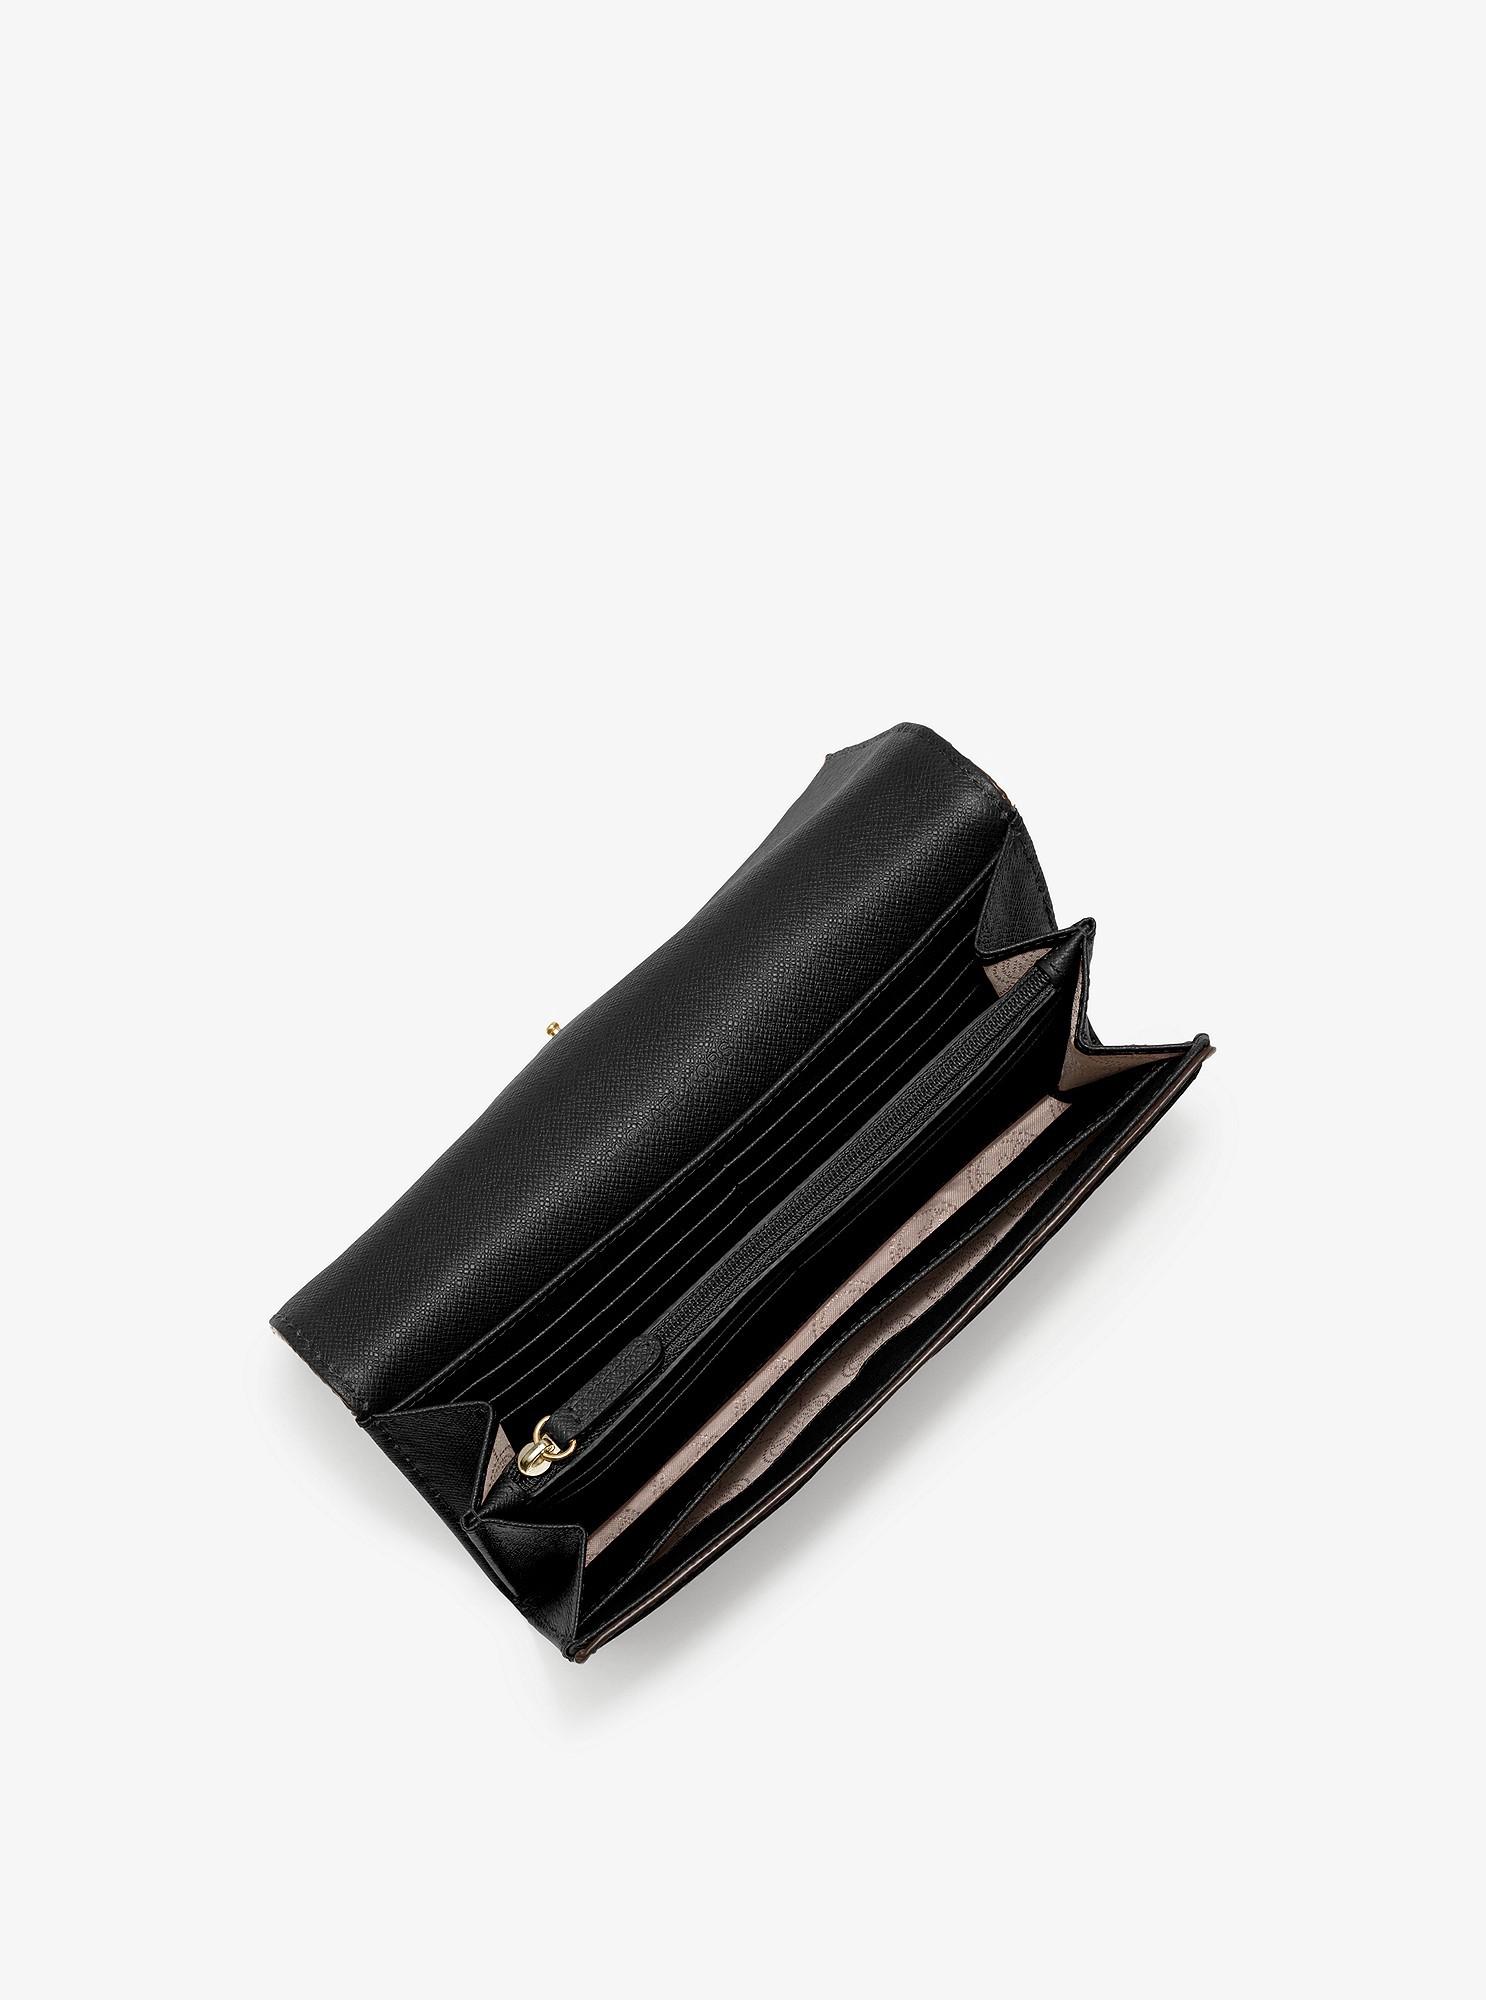 e4ce67f0f73b Michael Kors Fulton Leather Carryall Wallet - Black